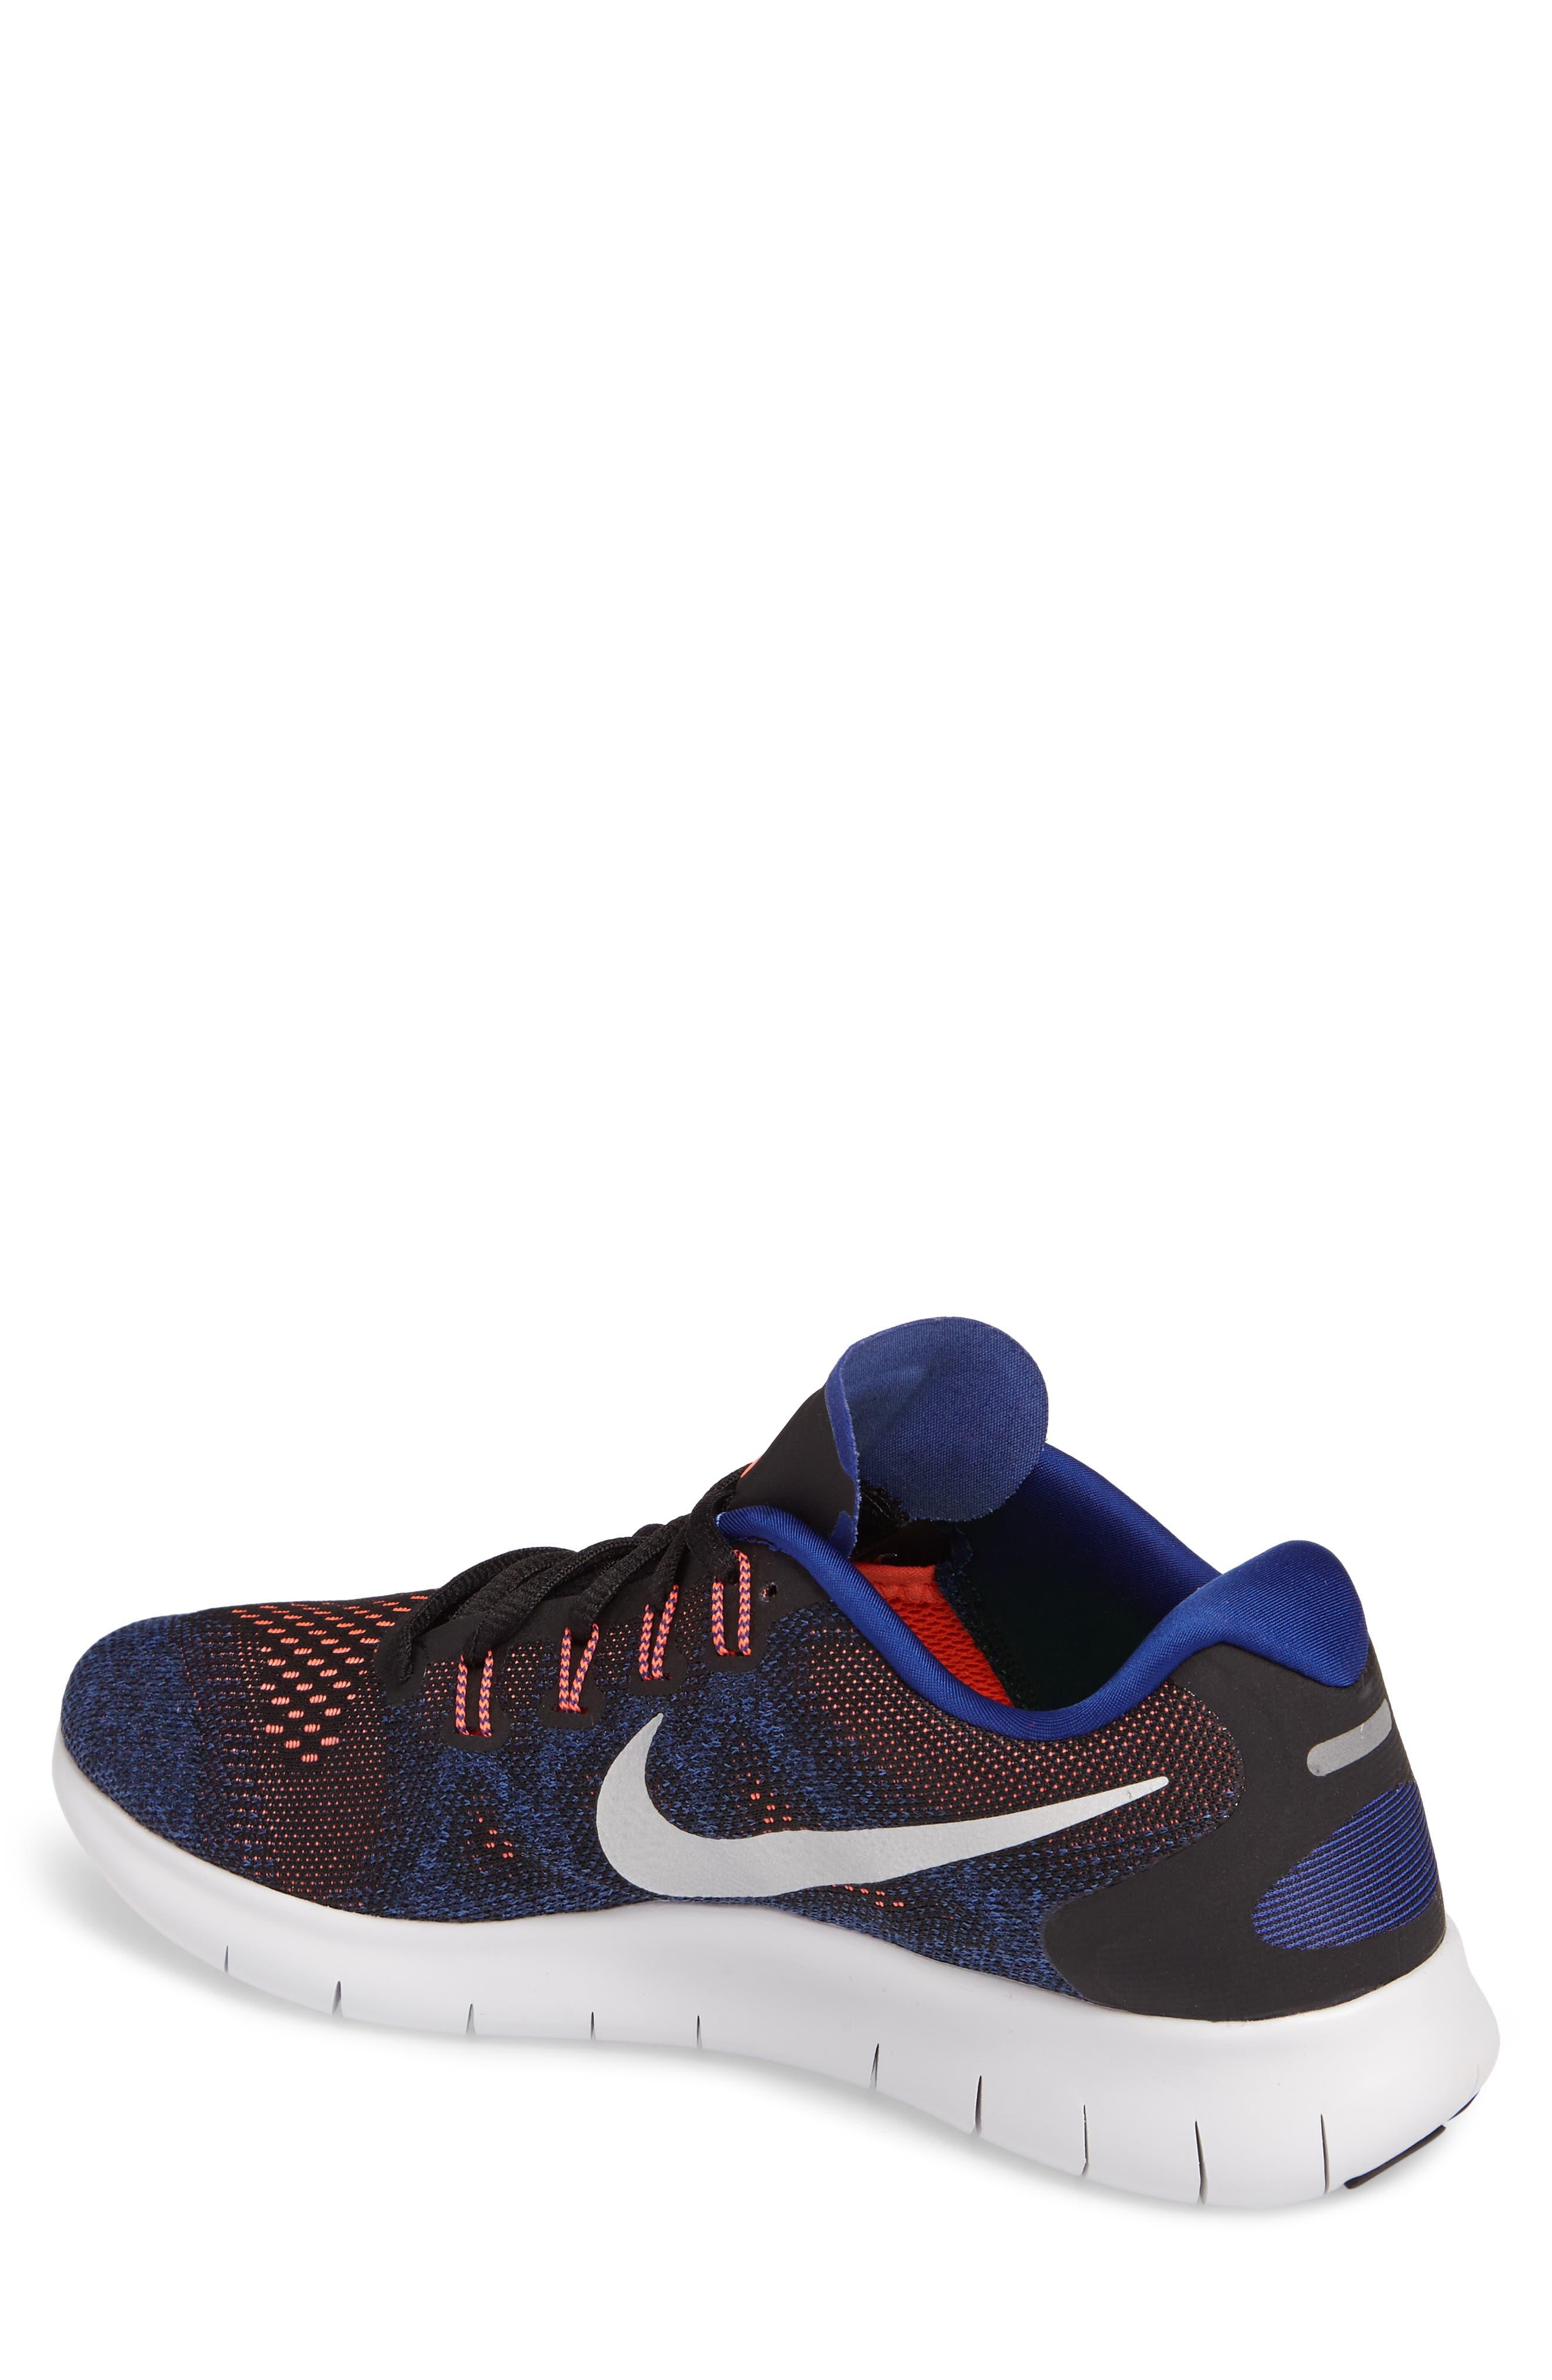 Free Run 2017 Running Shoe,                             Alternate thumbnail 16, color,